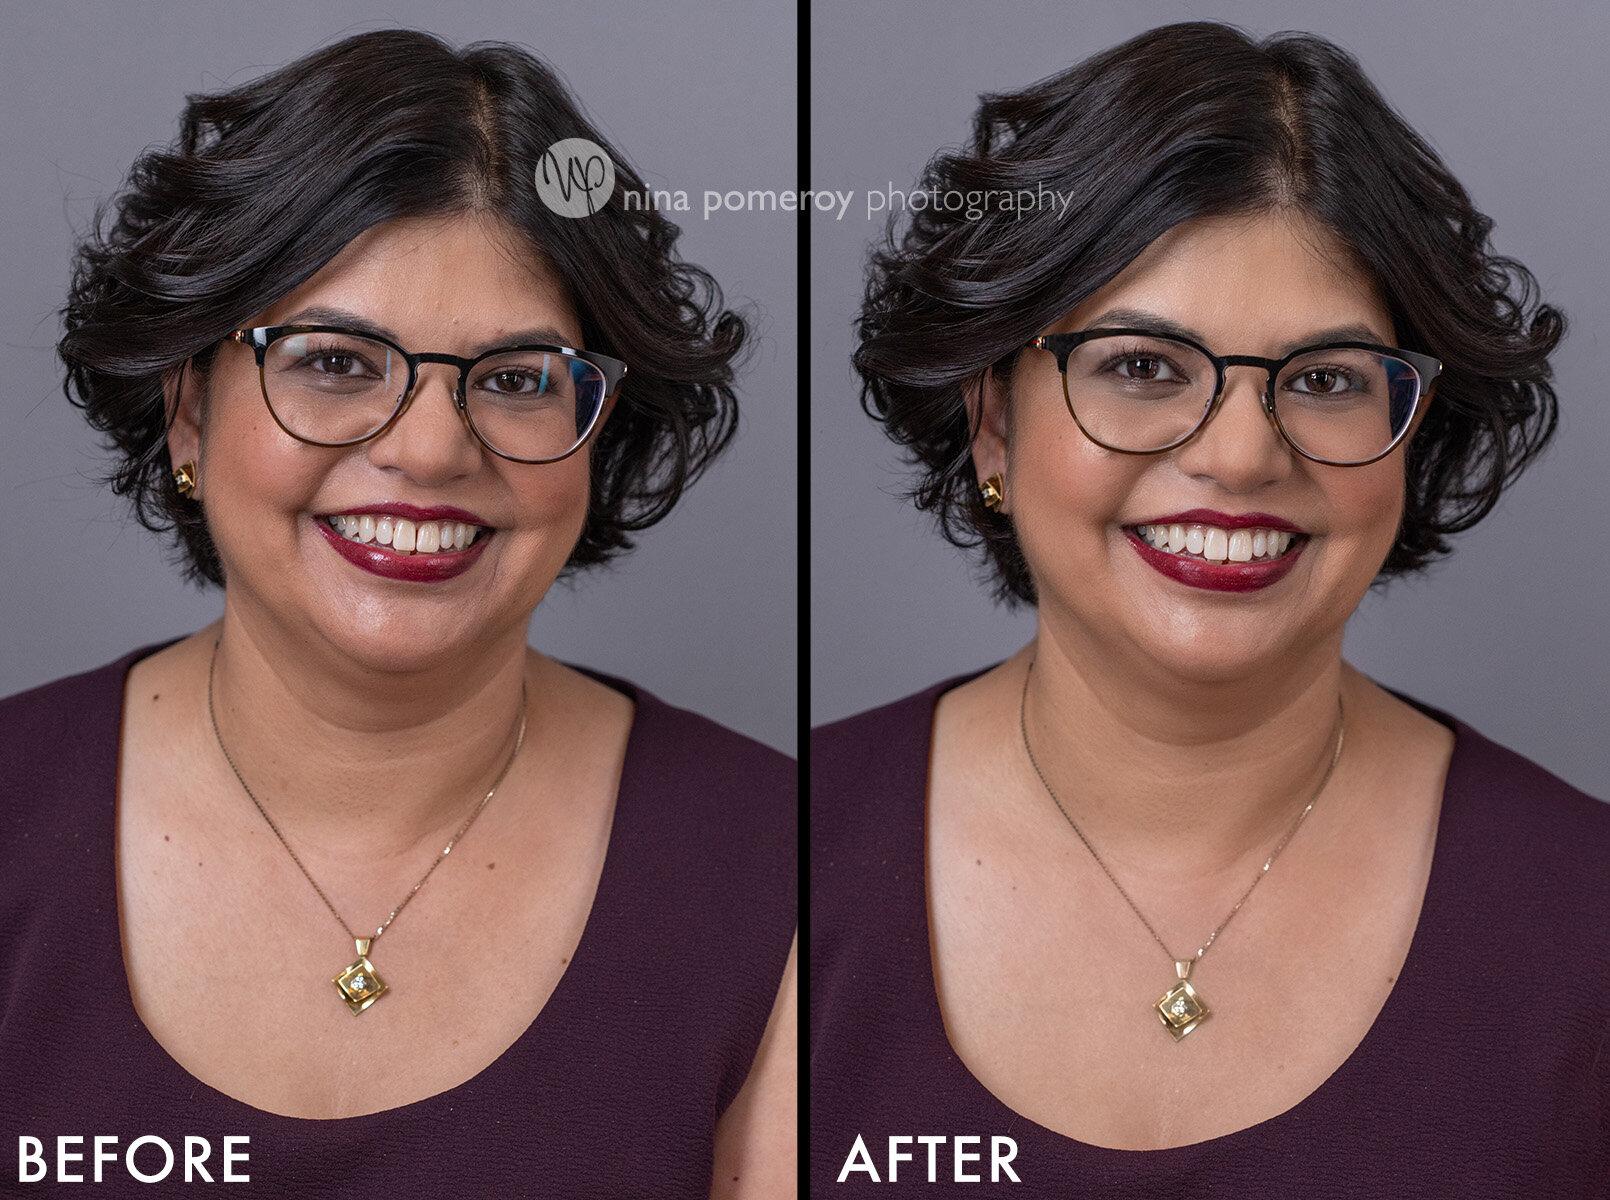 before-after-female-attorney-pleasanton-photographer-nina-pomeroy.jpg